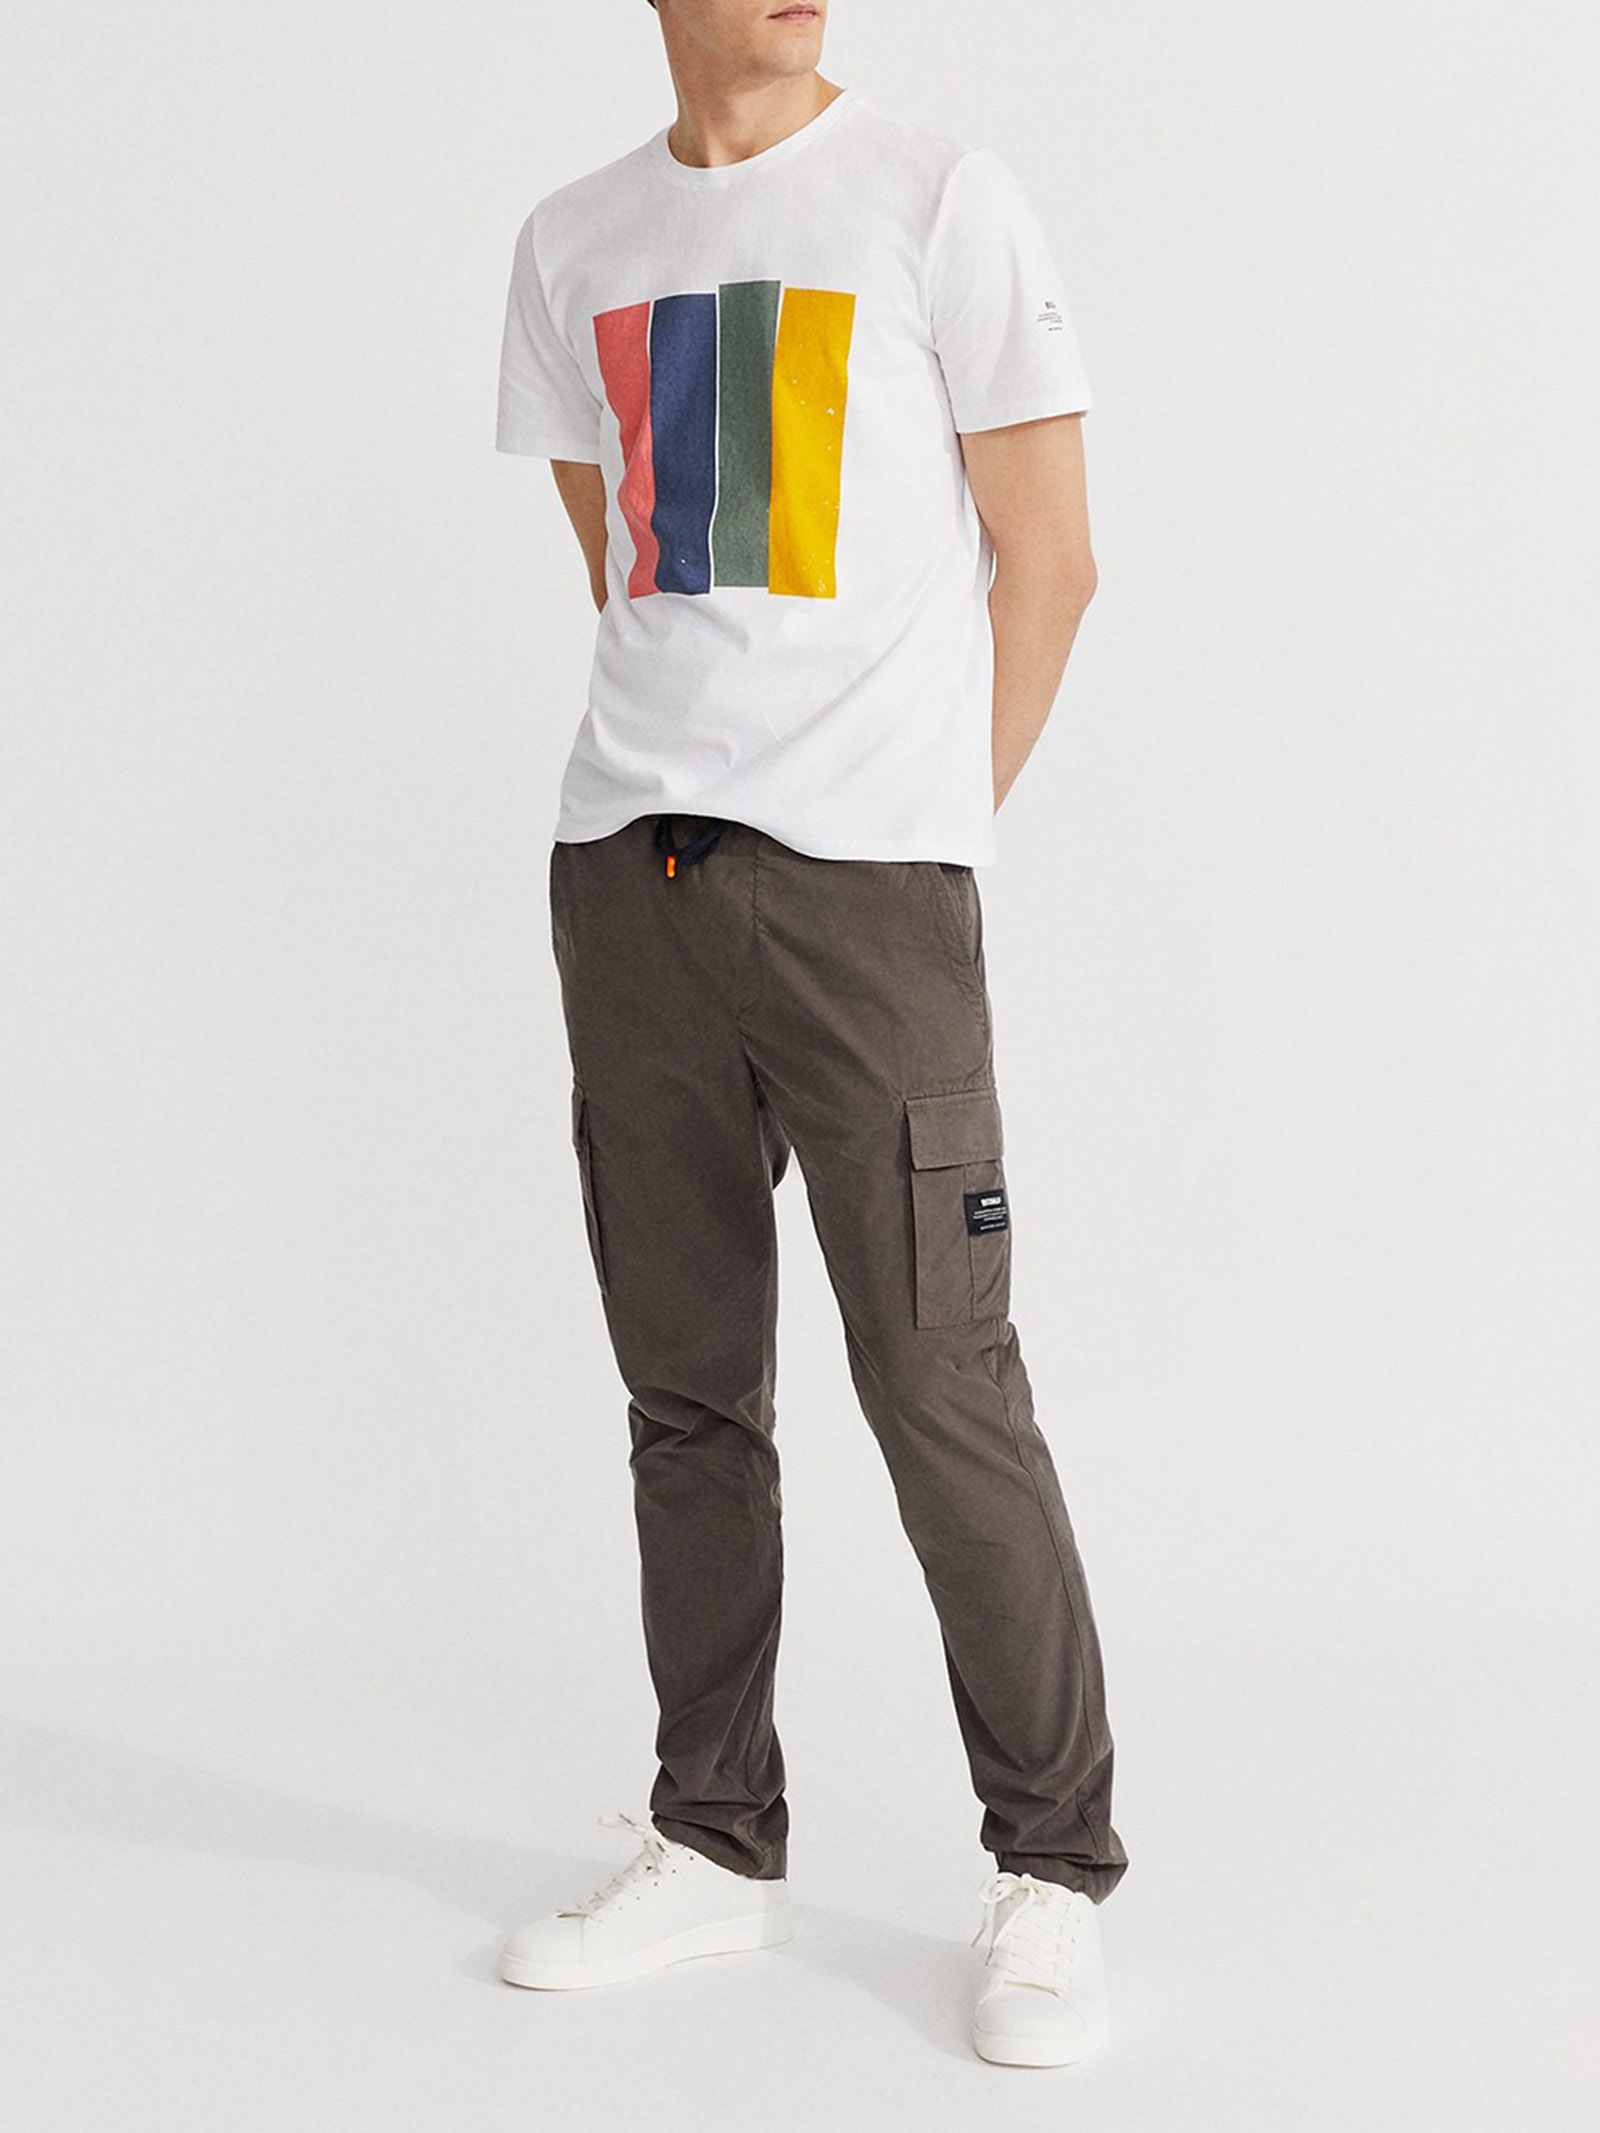 T-SHIRT IN COTONE ORGANICO ECOALF | T-shirt | ENROLL000